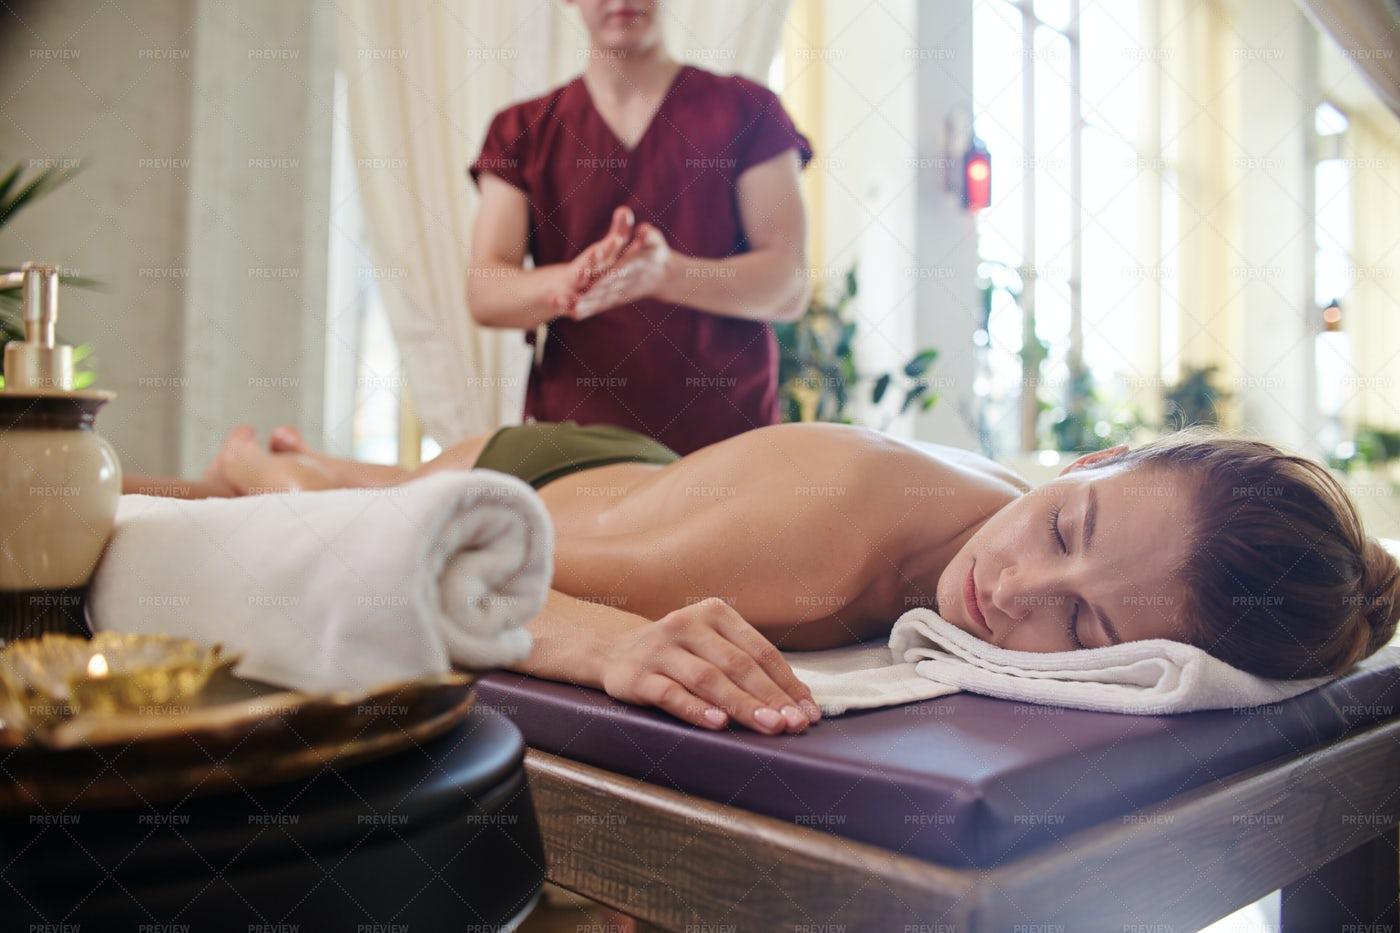 Massage In Luxury Spa Center: Stock Photos